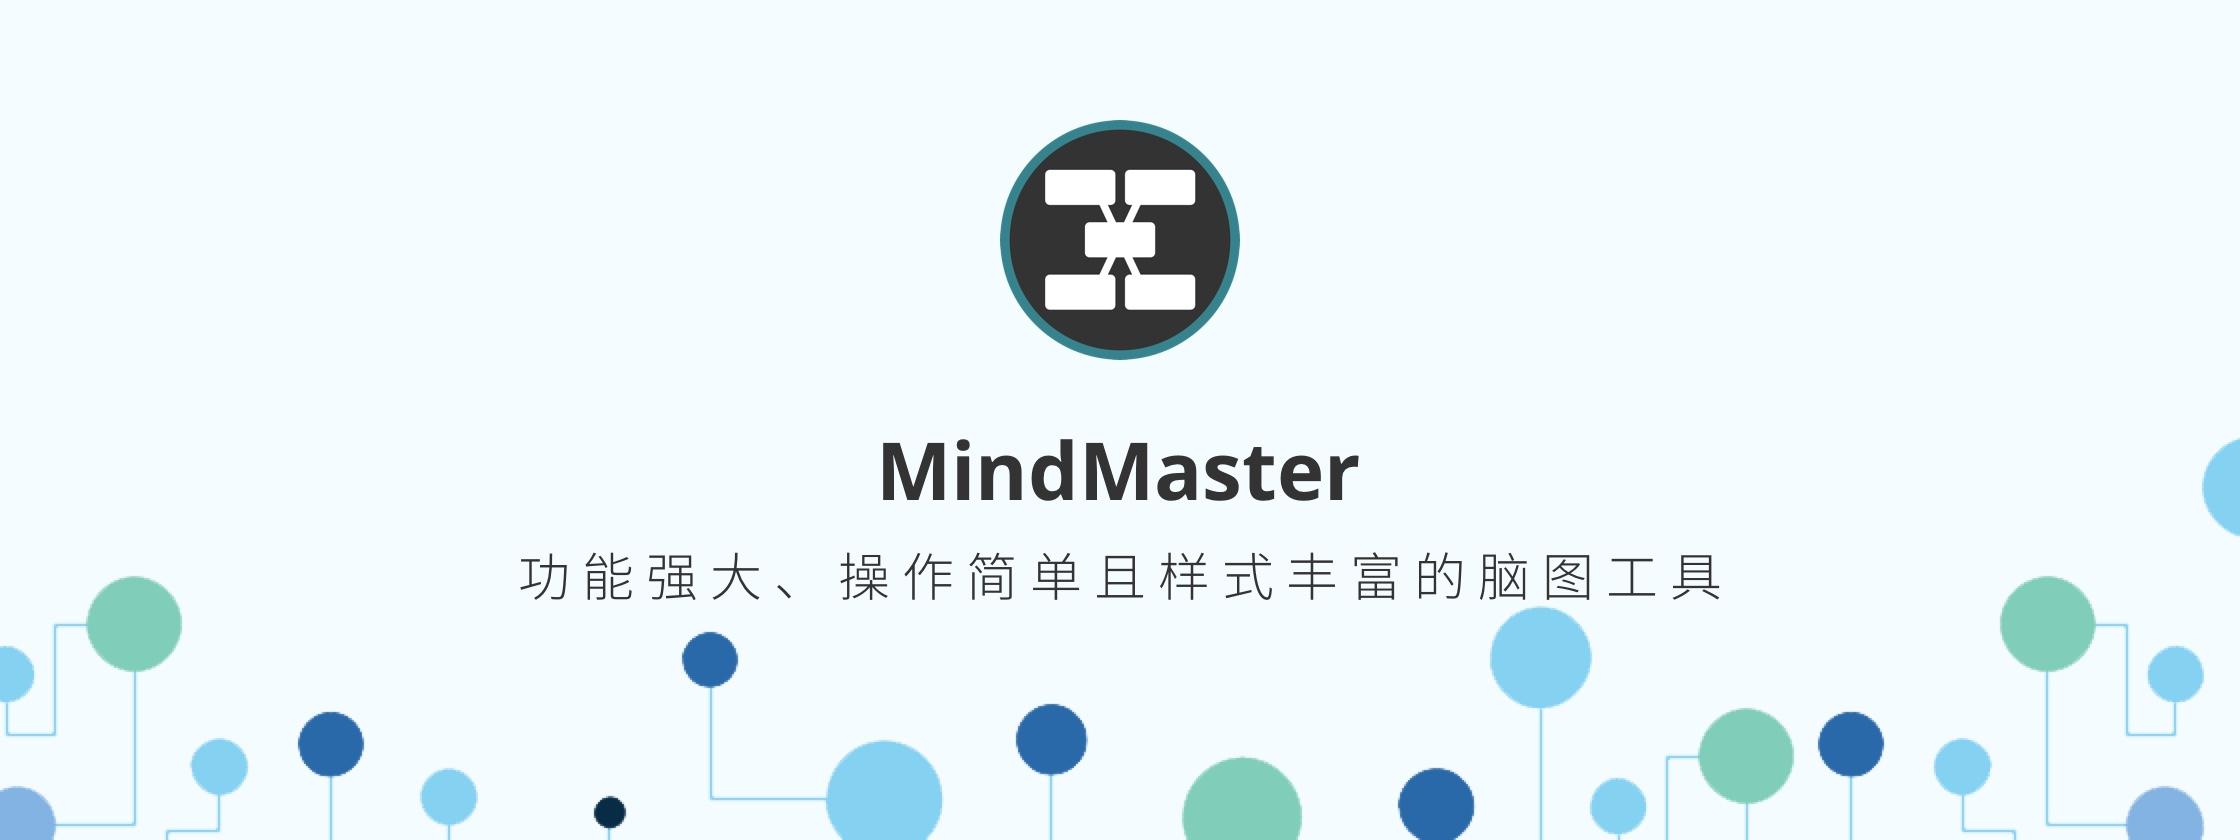 MindMaster:多功能思维导图工具